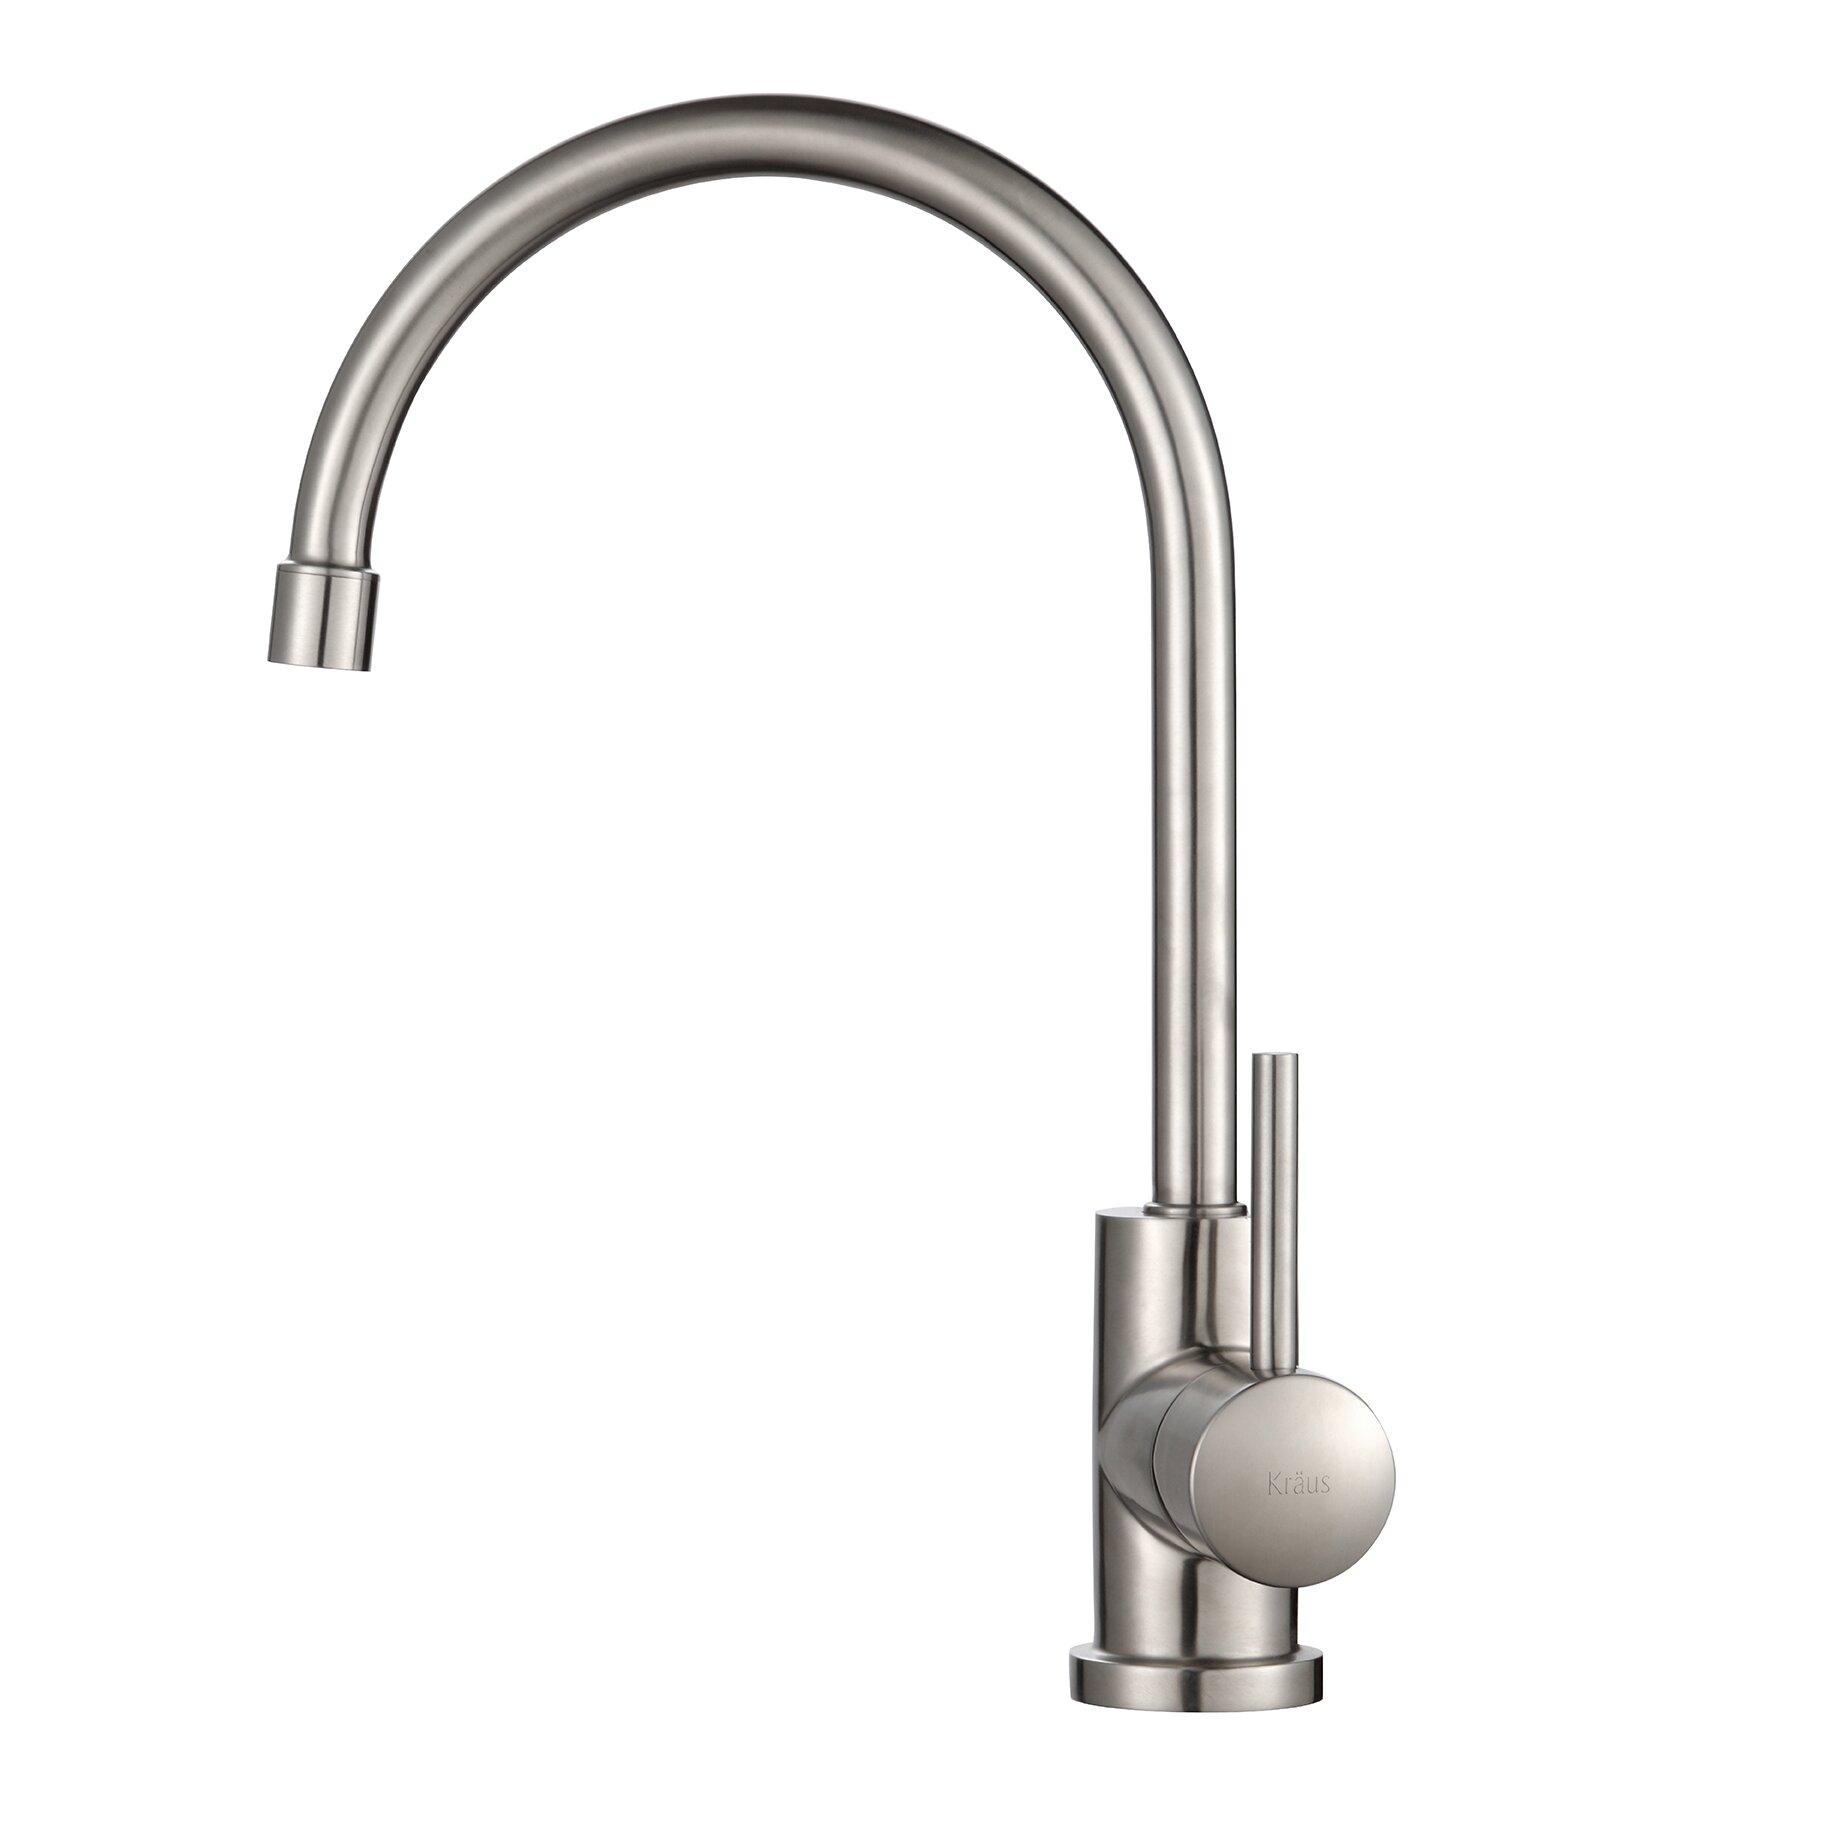 Kraus Faucets Reviews : Kraus One Handle Single Hole Kitchen Faucet & Reviews Wayfair